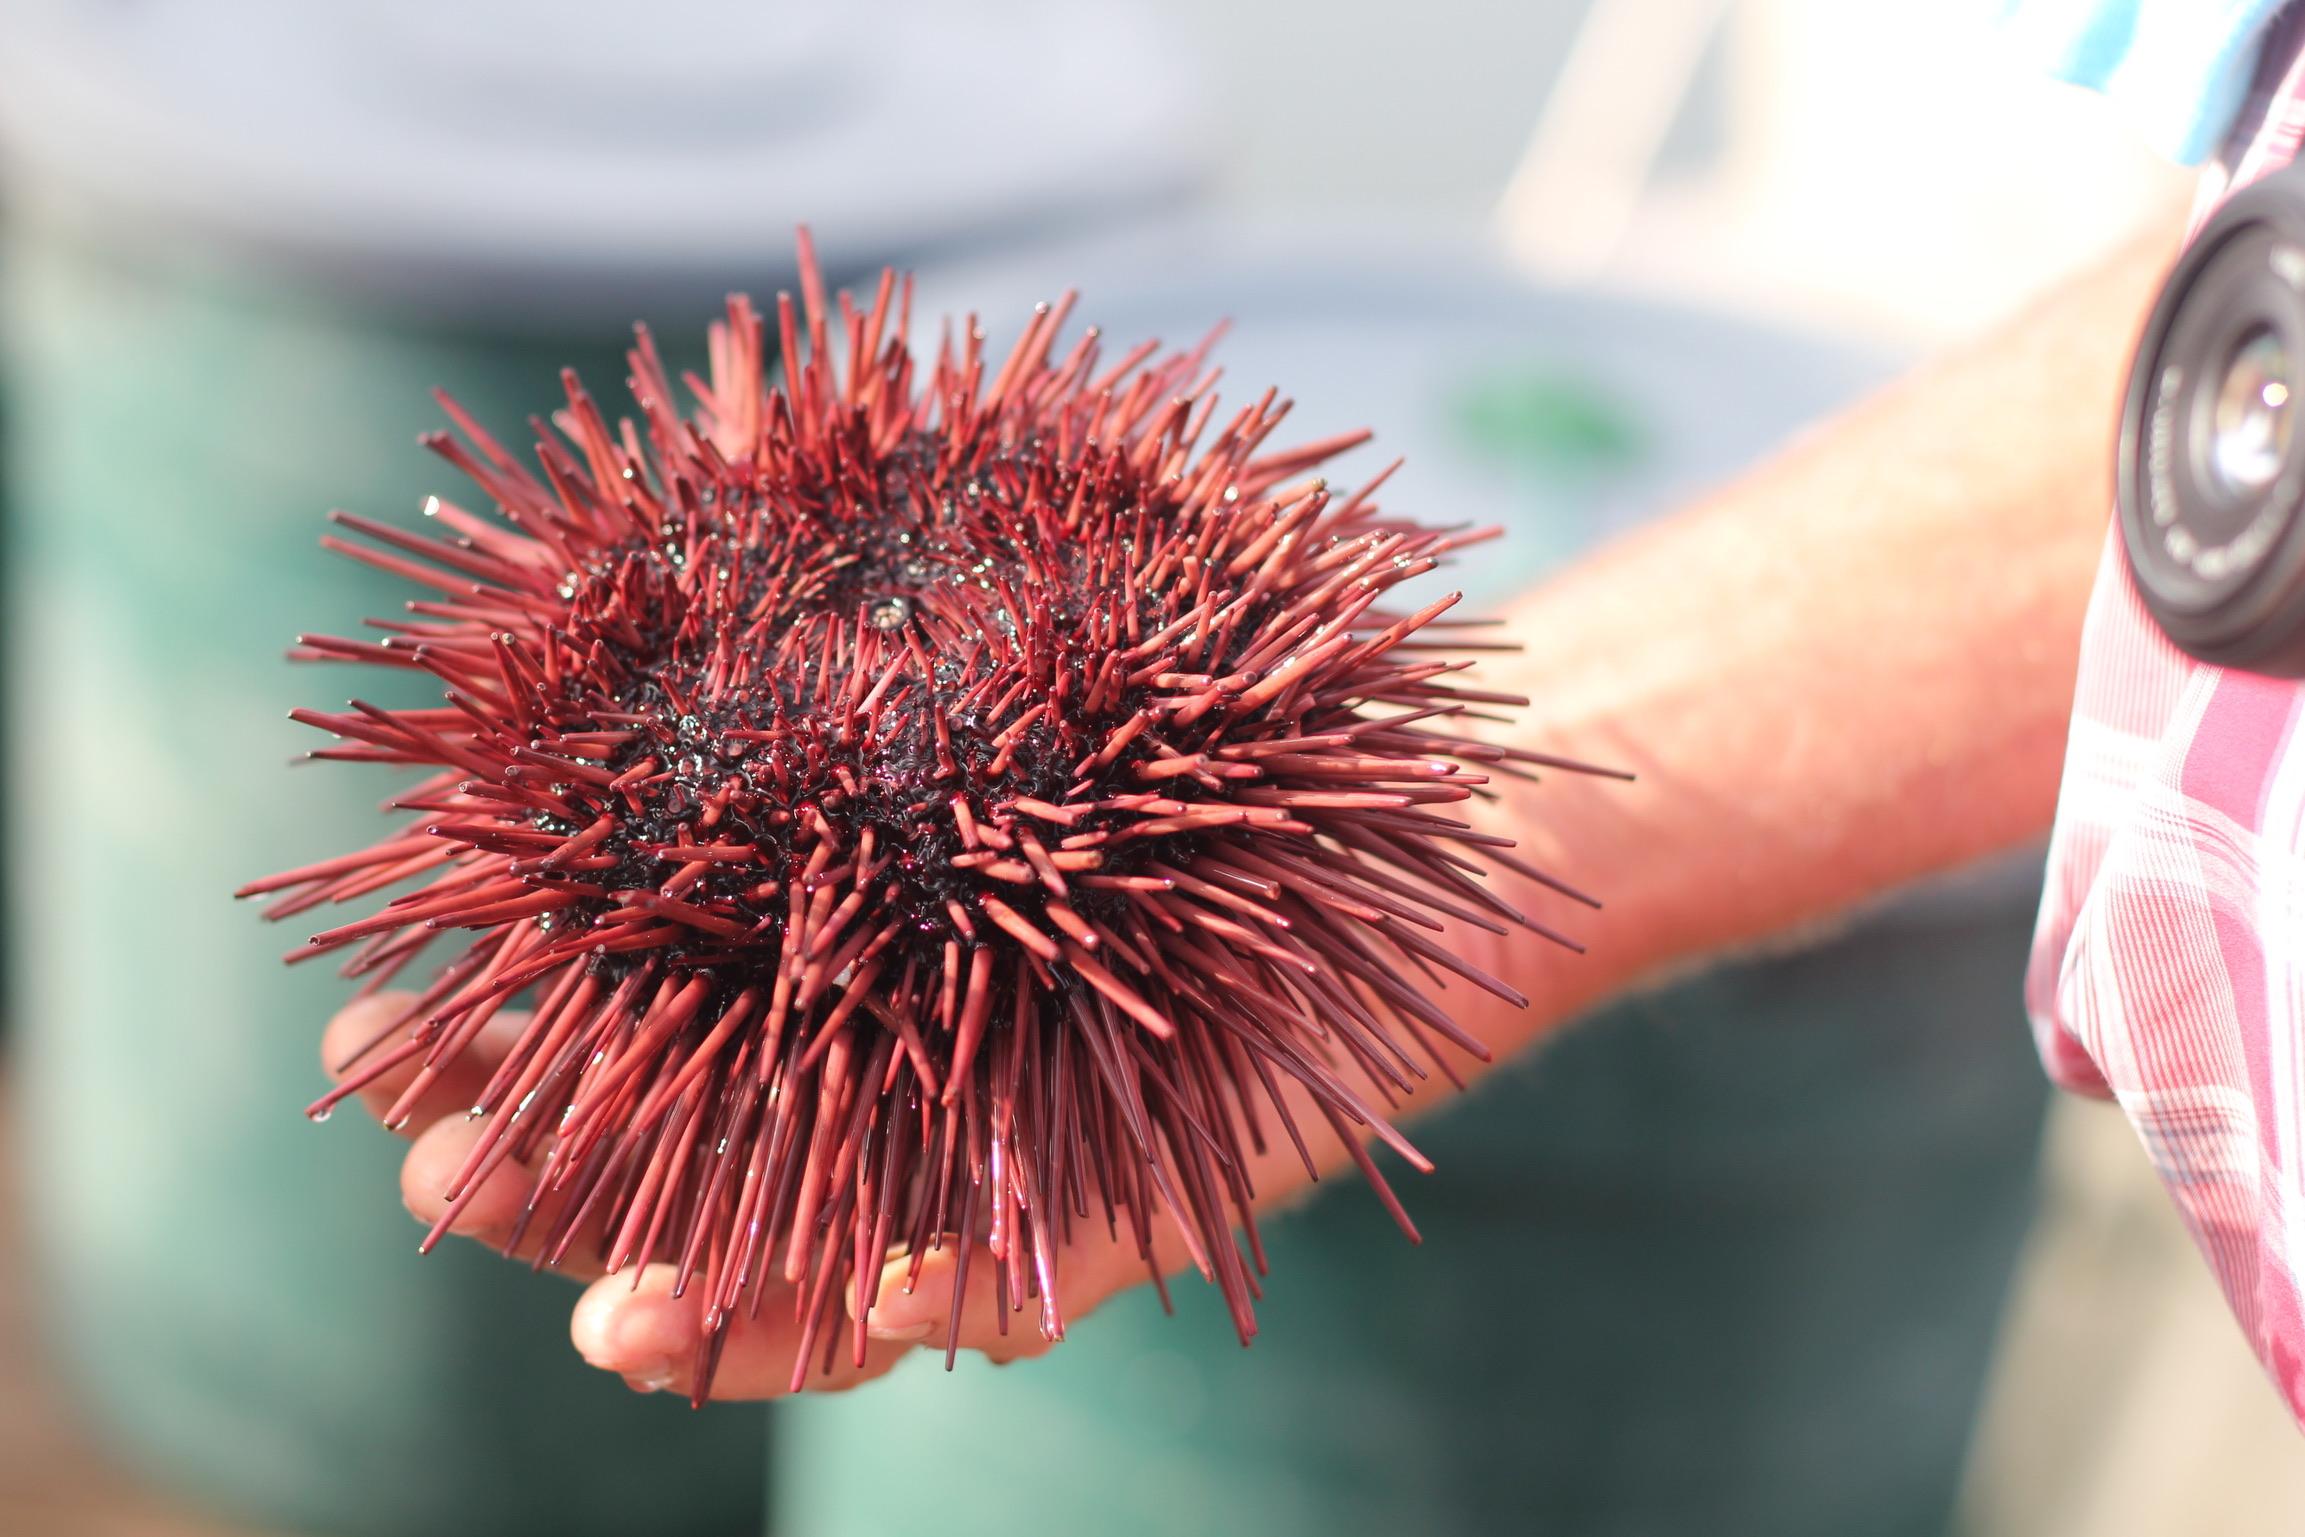 Red sea urchin up close.